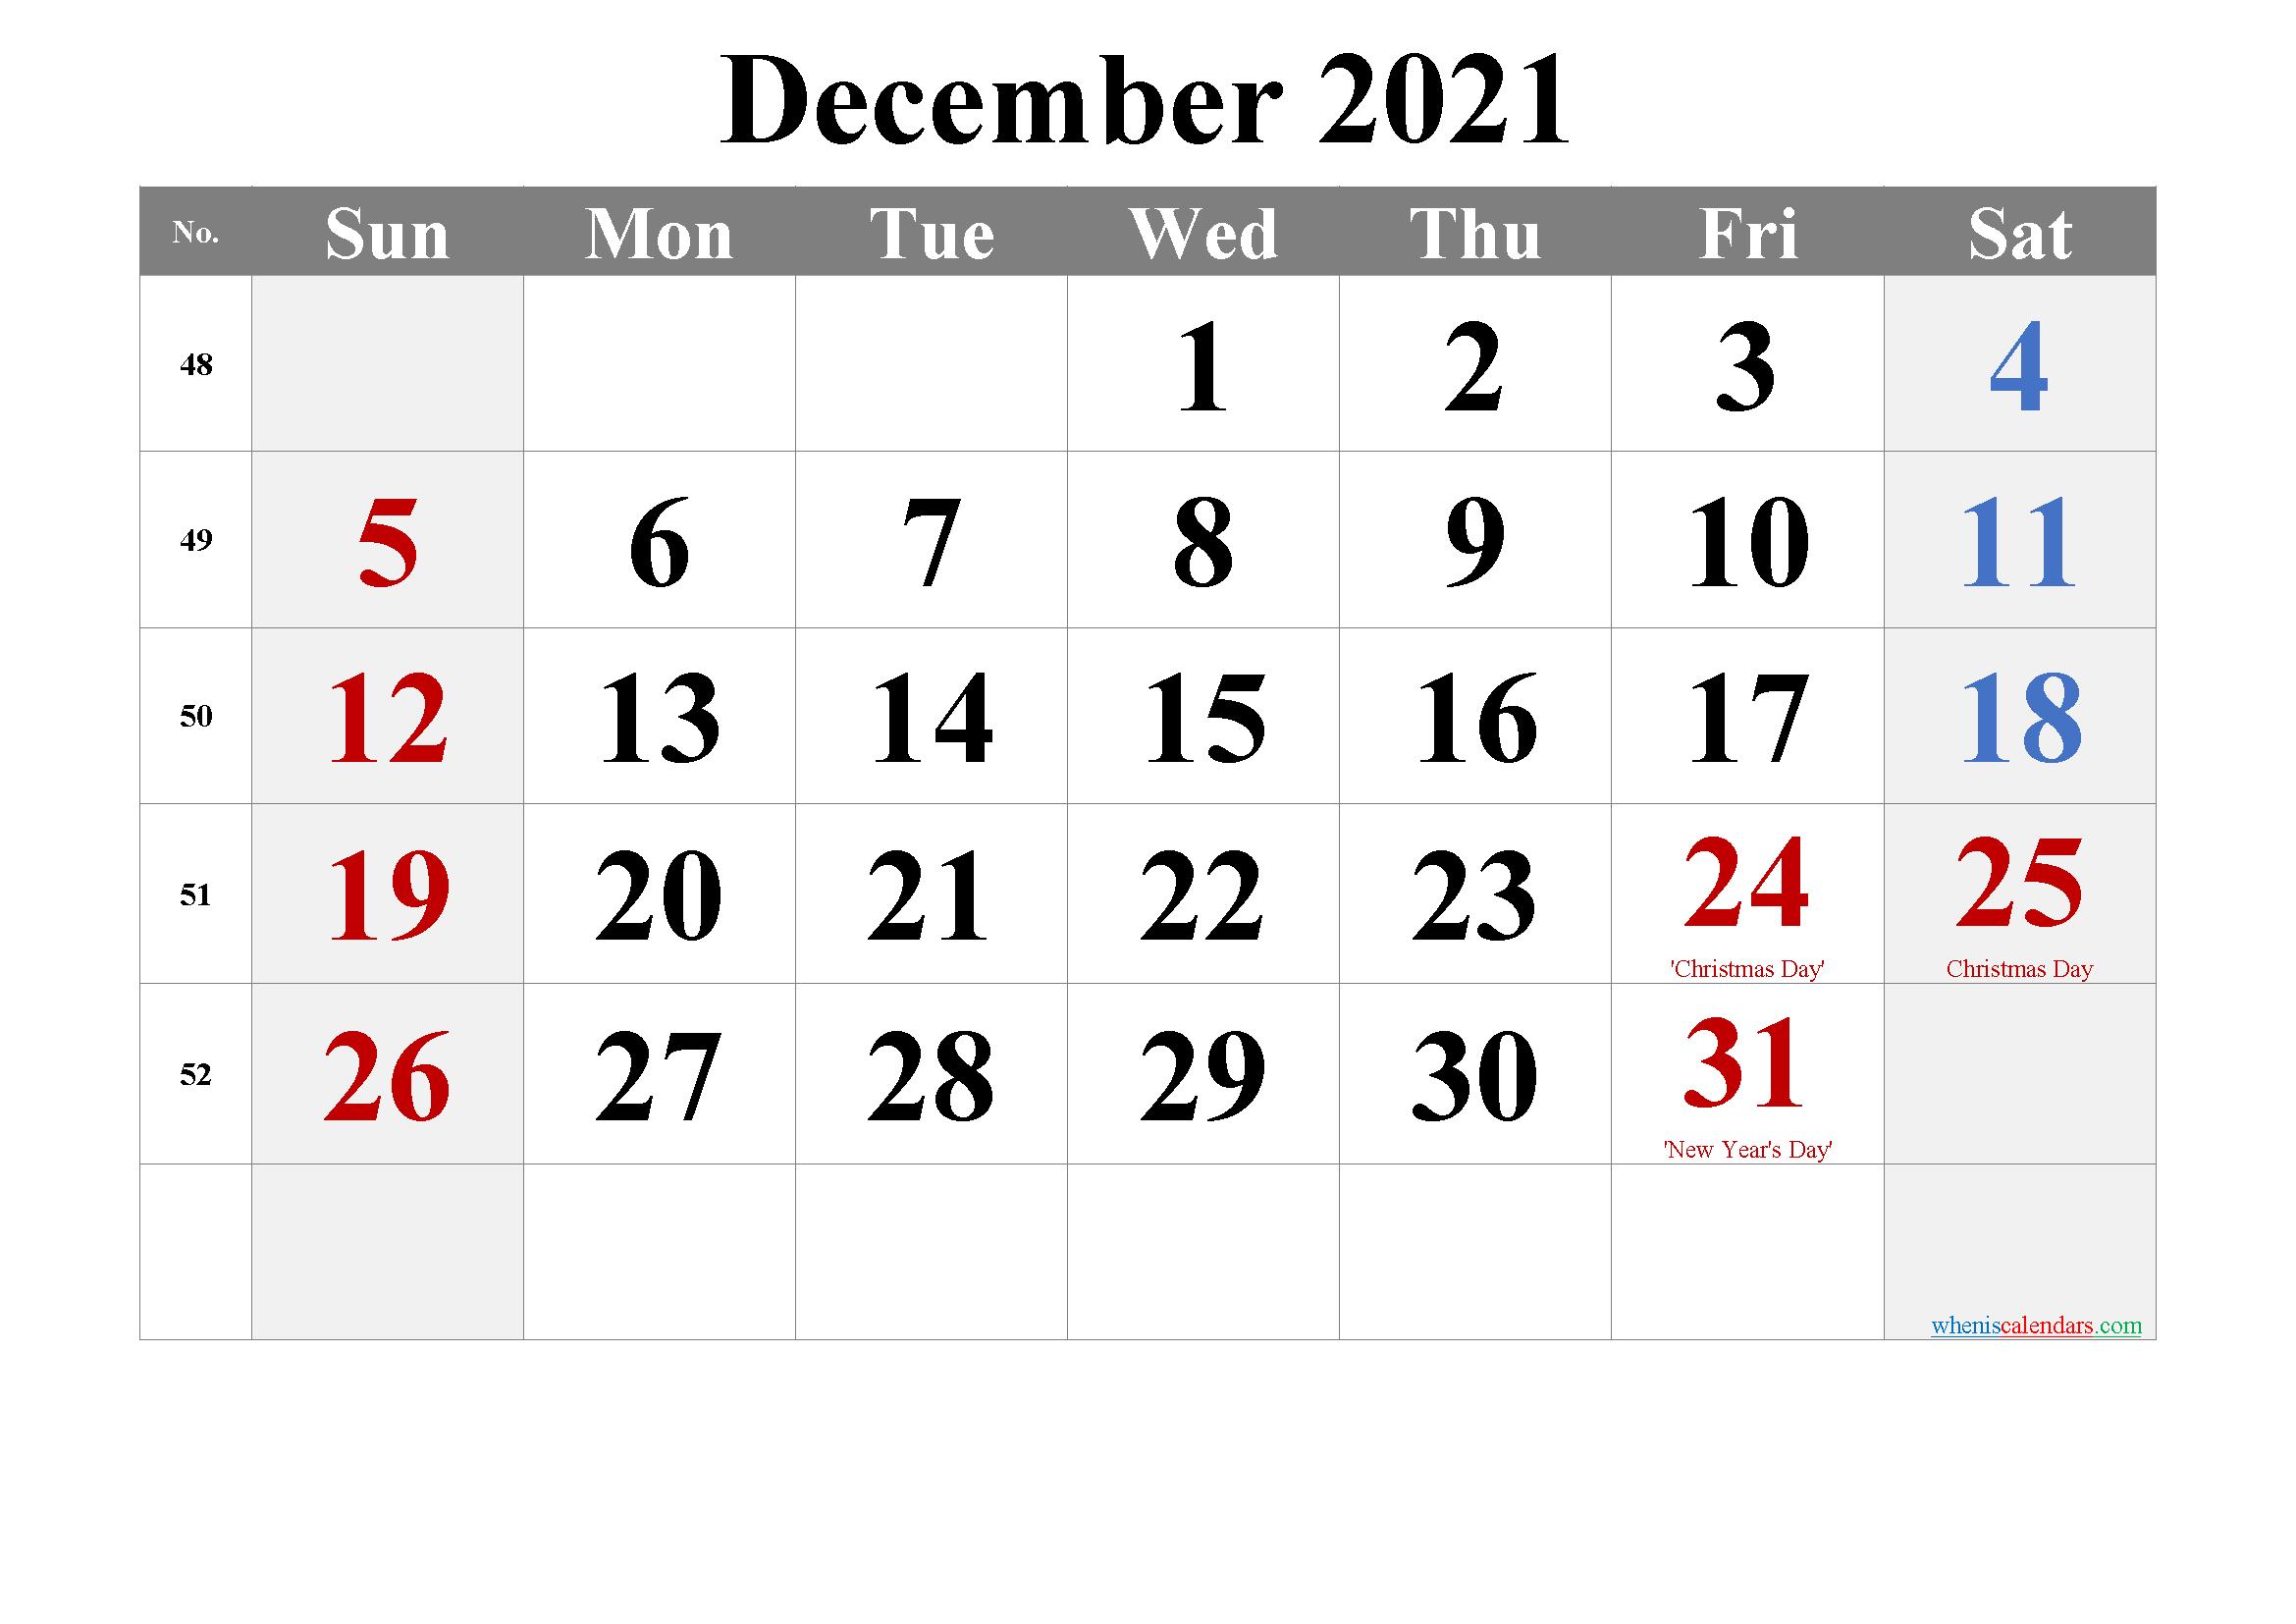 December 2021 Printable Calendar With Holidays - 6